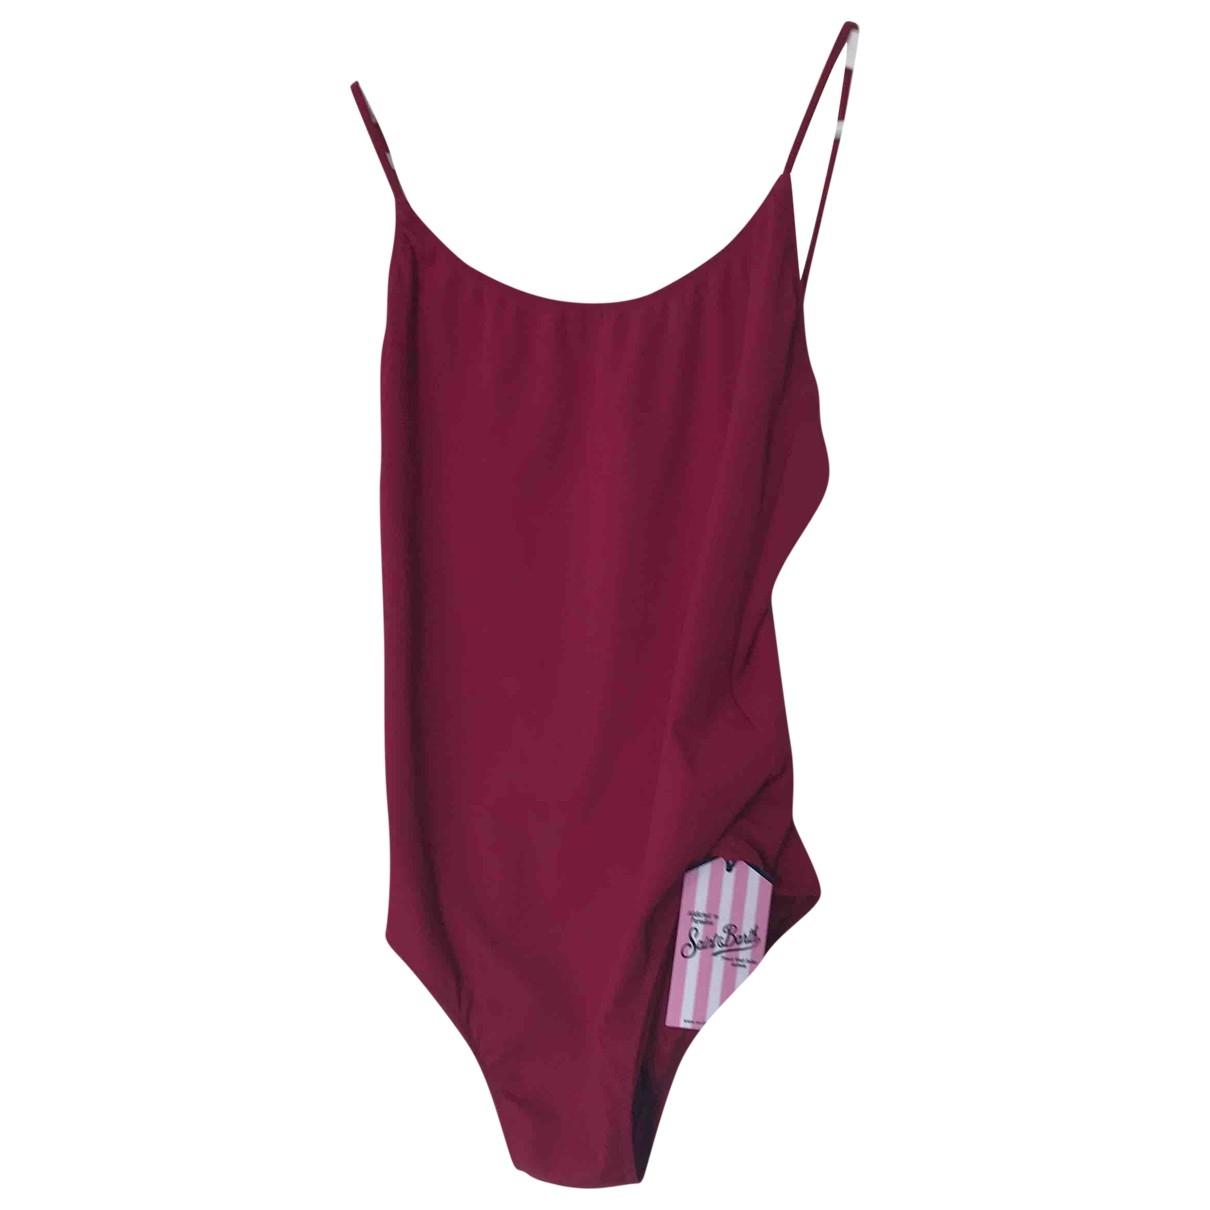 Mc2 Saint Barth \N Burgundy Swimwear for Women M International